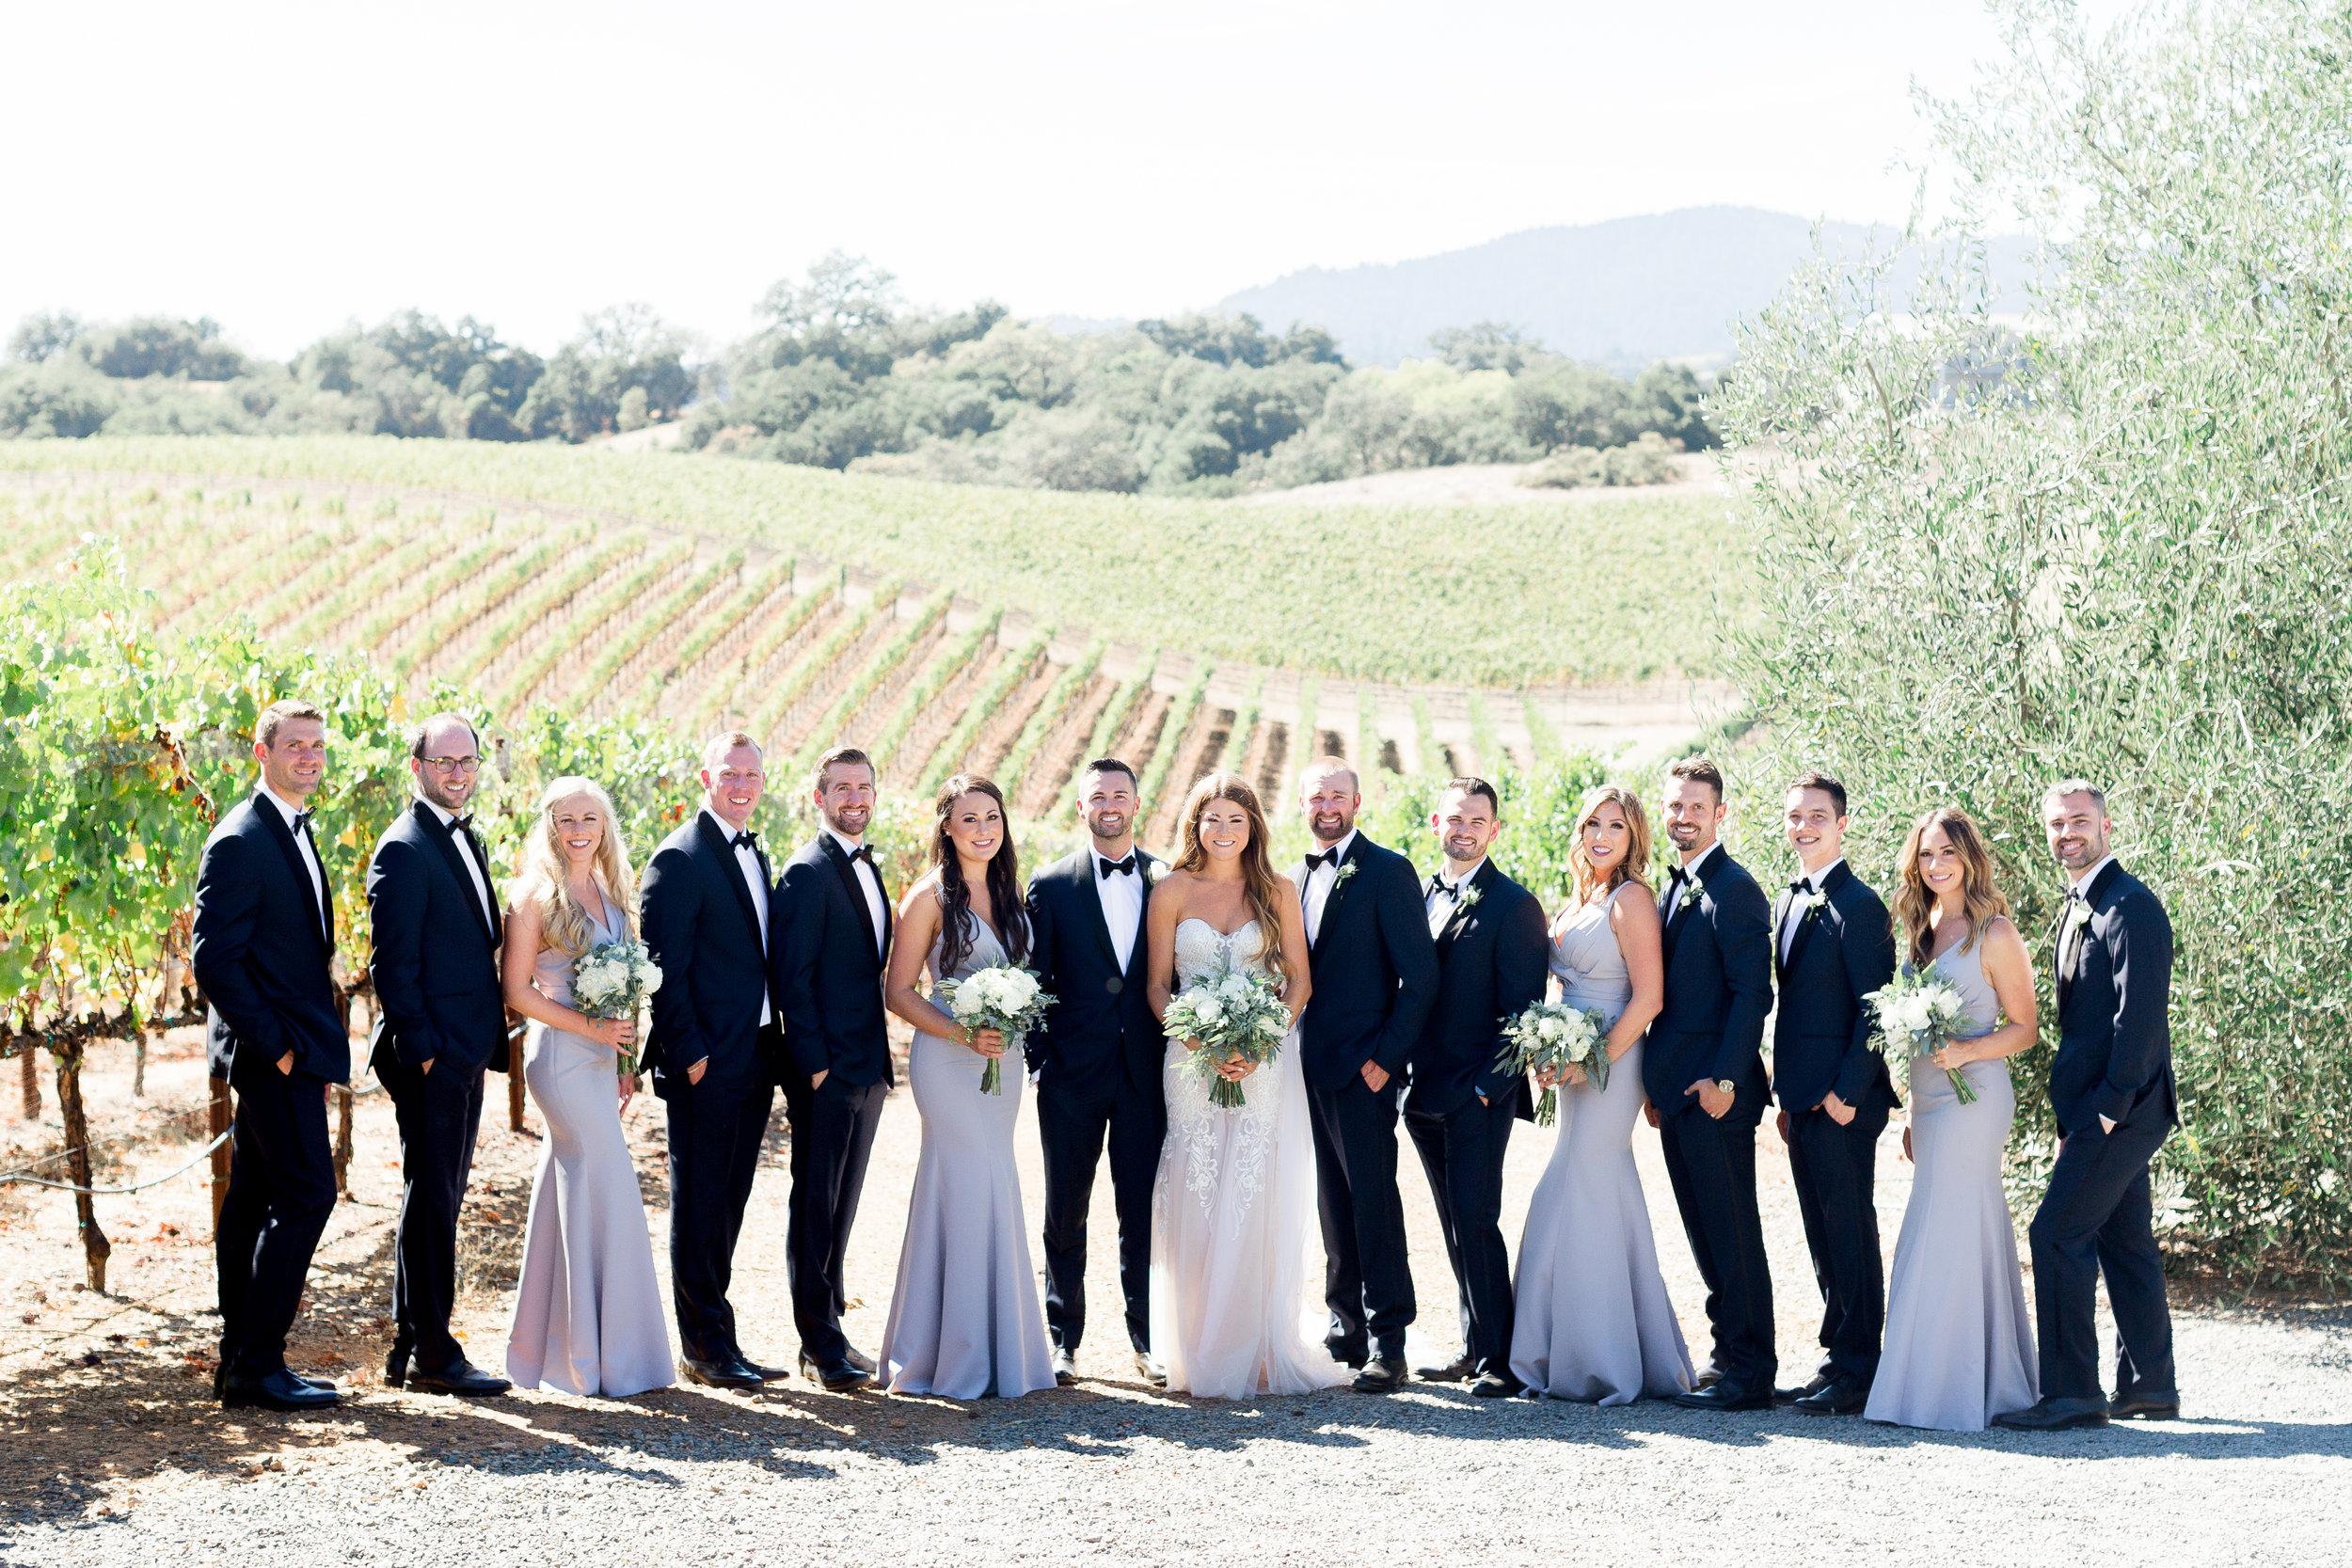 Calegari-Vineyards-Healdsburg-Wedding-Photographer (90 of 262).jpg